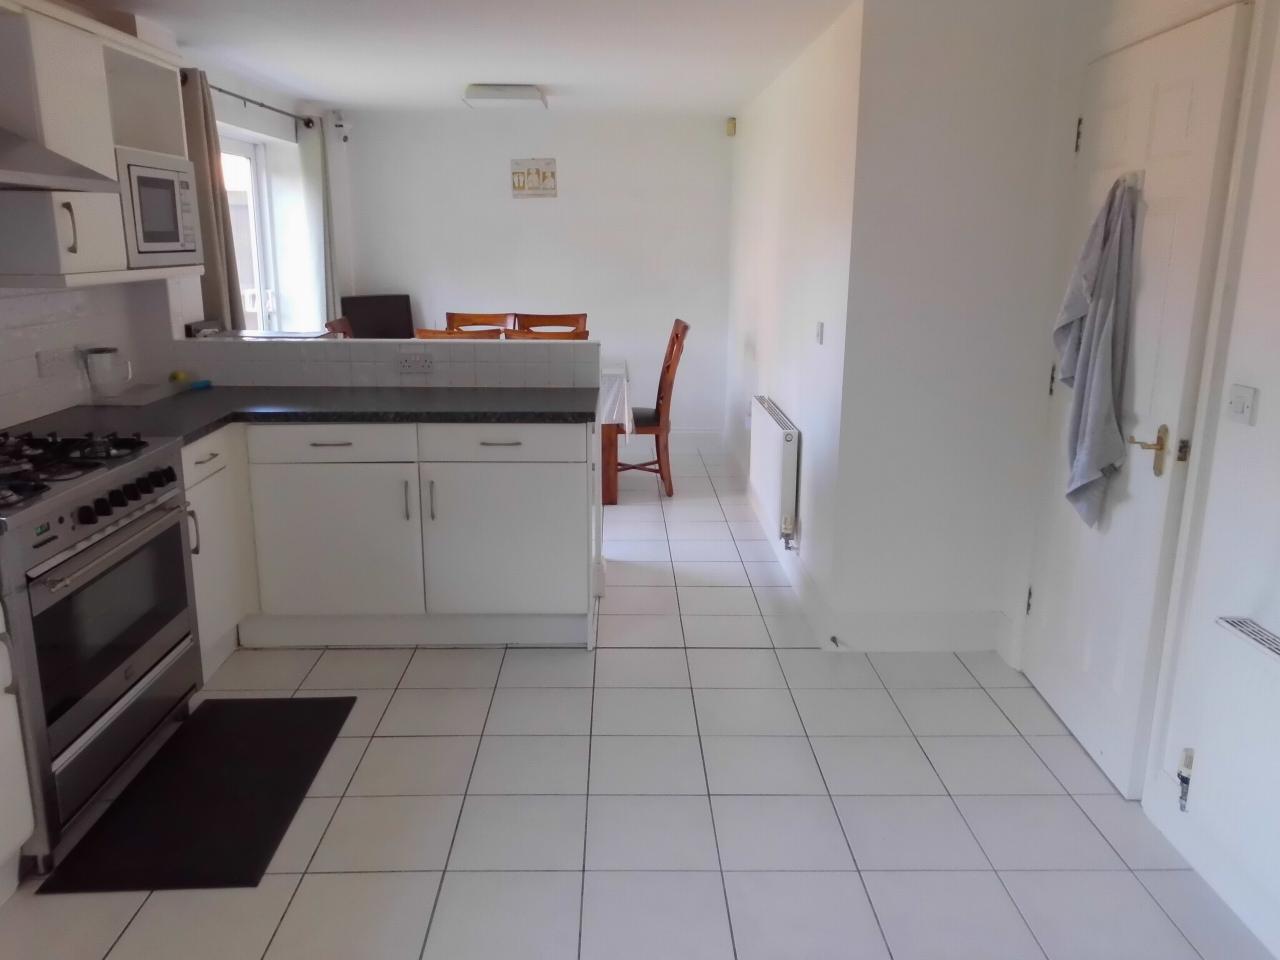 5 Bedroom Detached House For Sale 4 Cransley Close Image 6